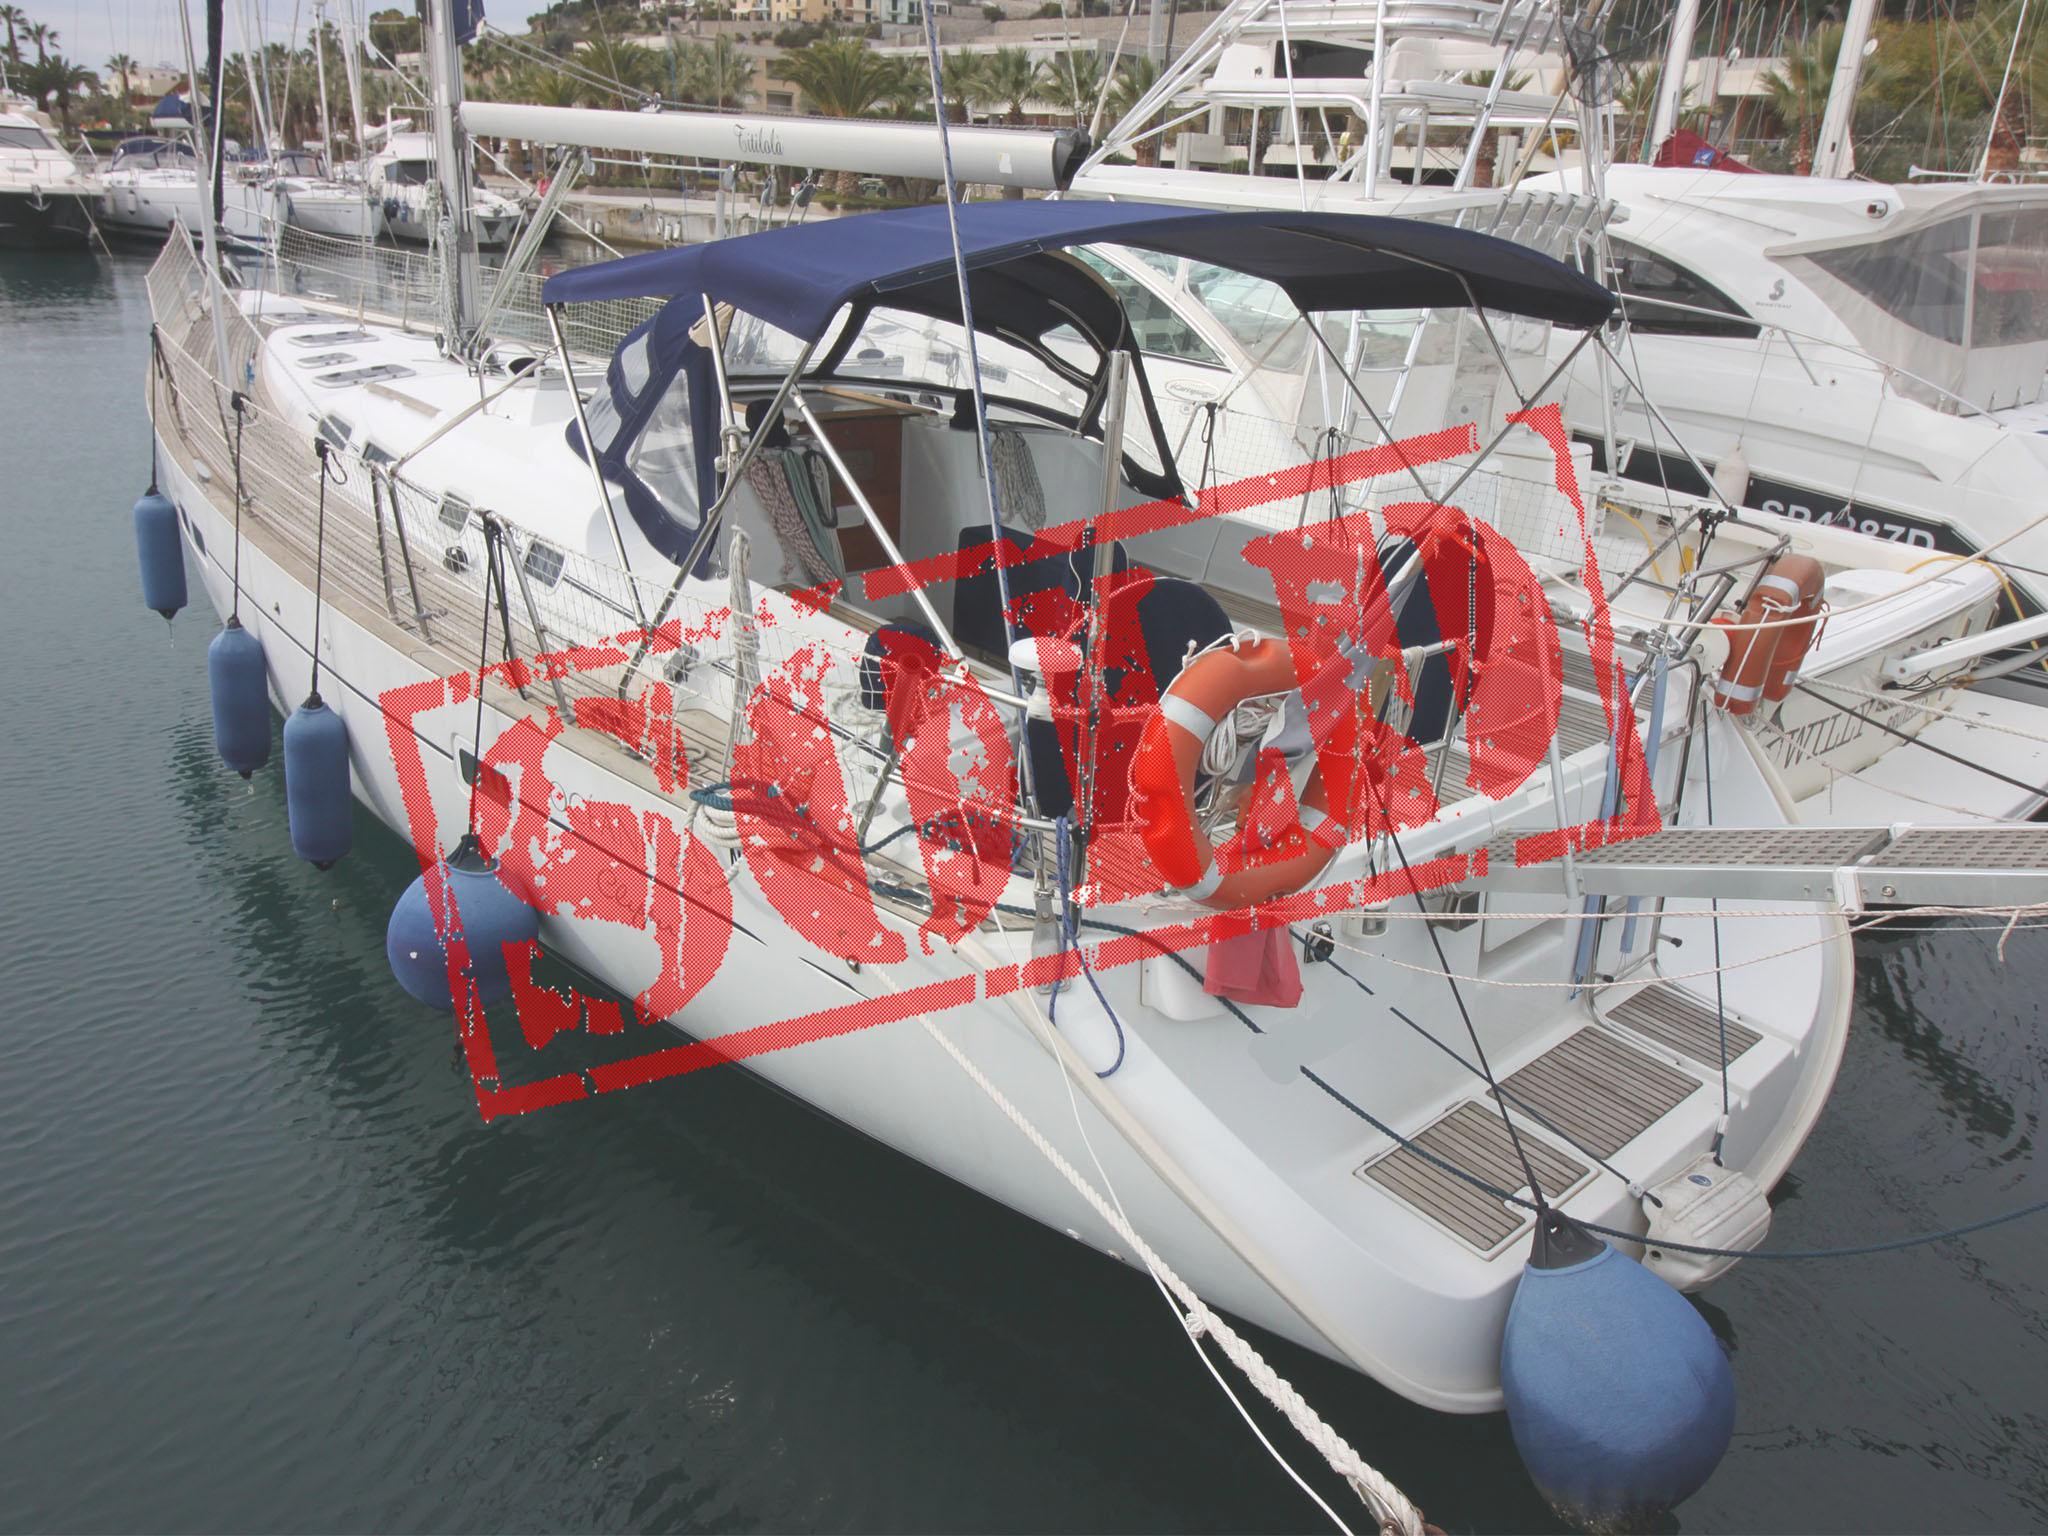 Beneteau Oceanis 473 sold